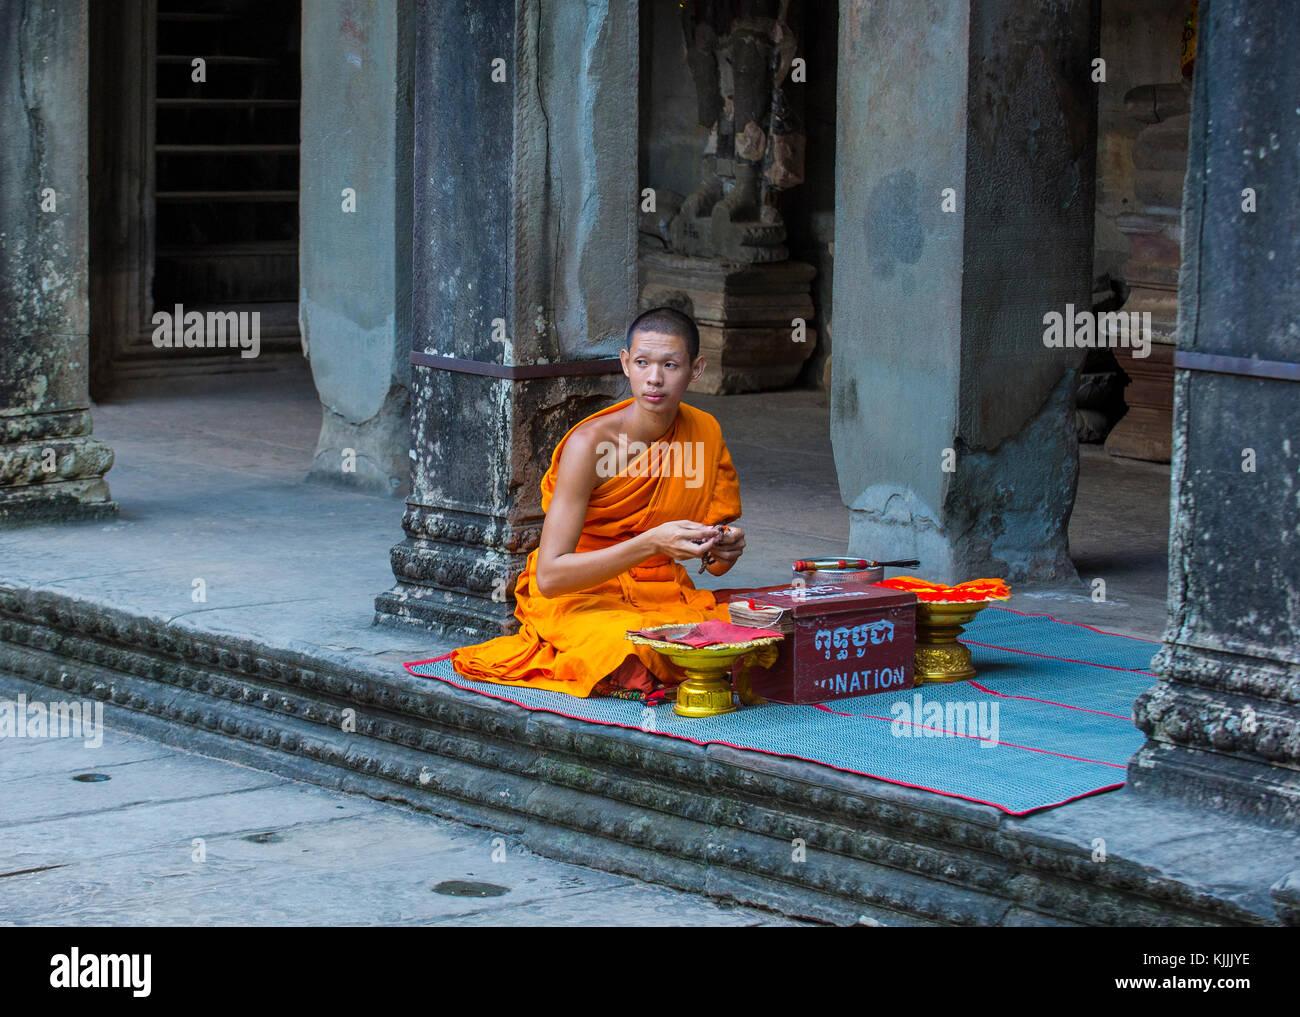 Budhist monje en el templo de Angkor Wat en Siem Reap, Camboya Foto de stock